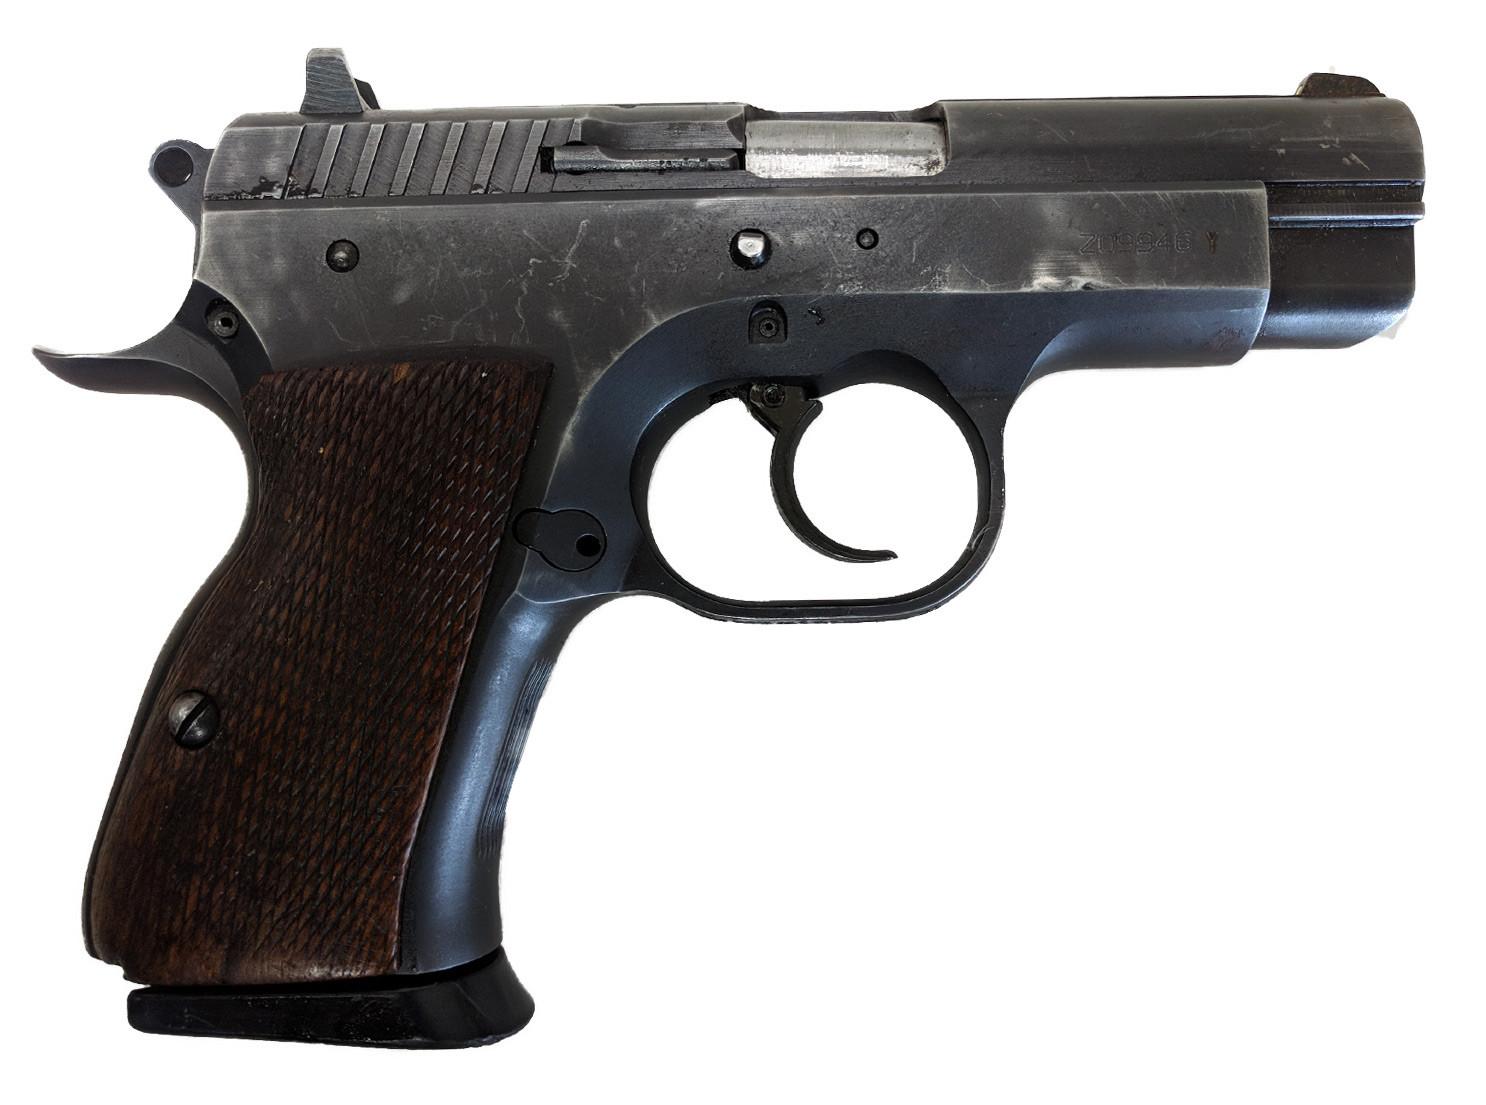 "IMI Desert Eagle, 9mm, 3.5"" Barrel, *Good*"